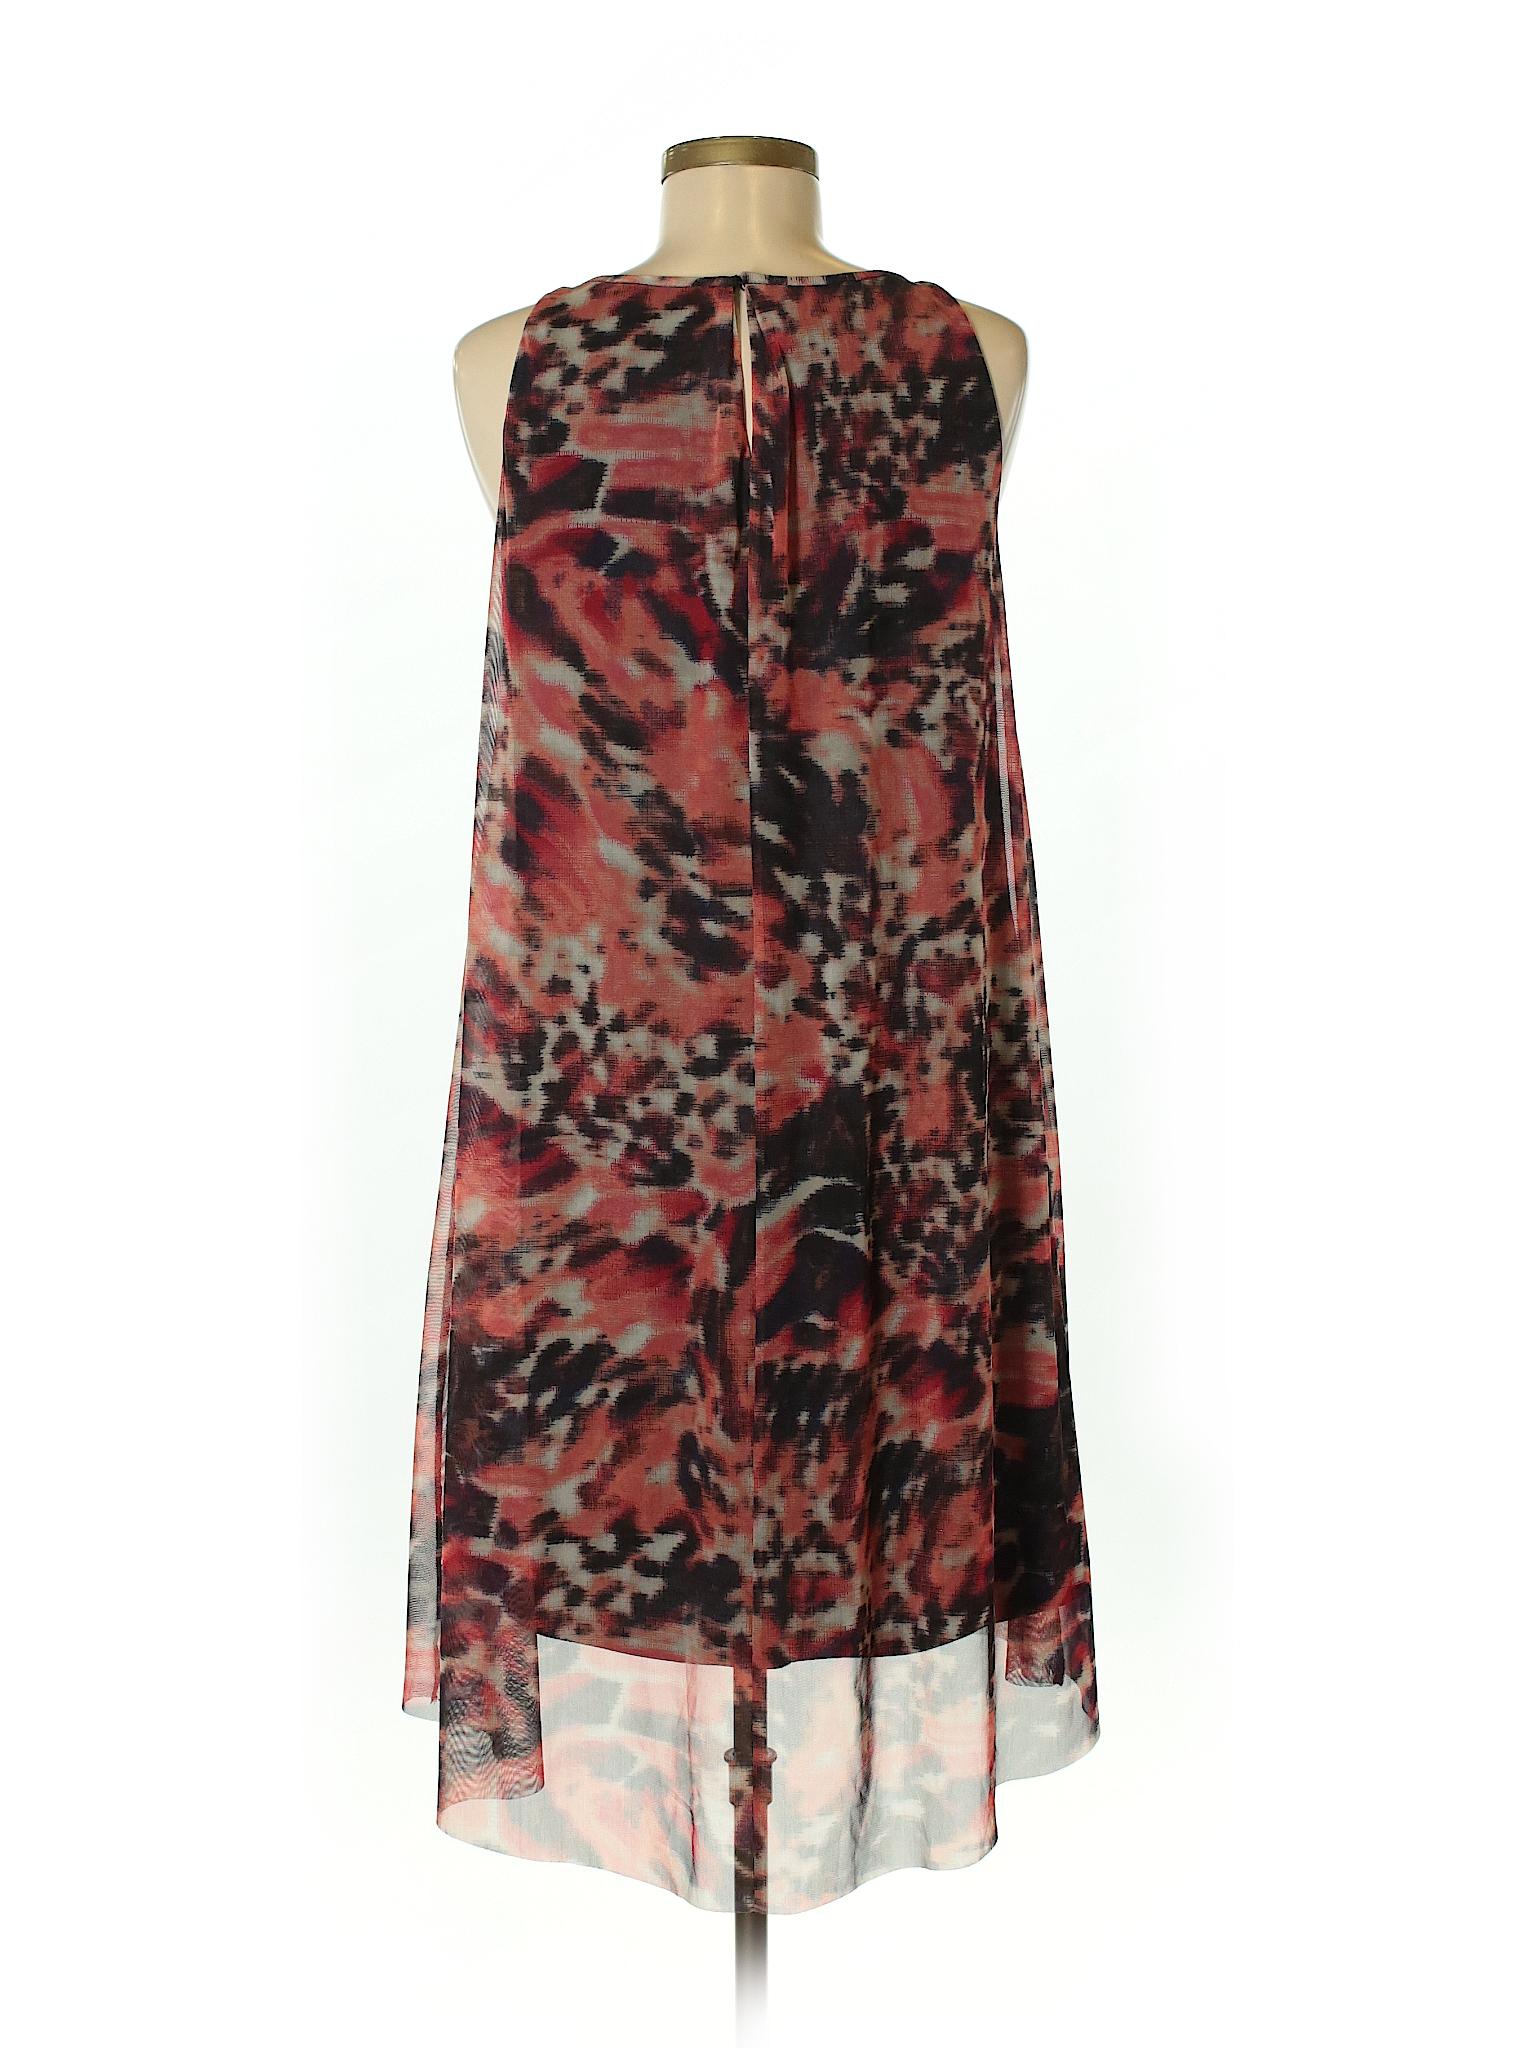 Boutique London winter Times Dress Casual ZZrwqdR5